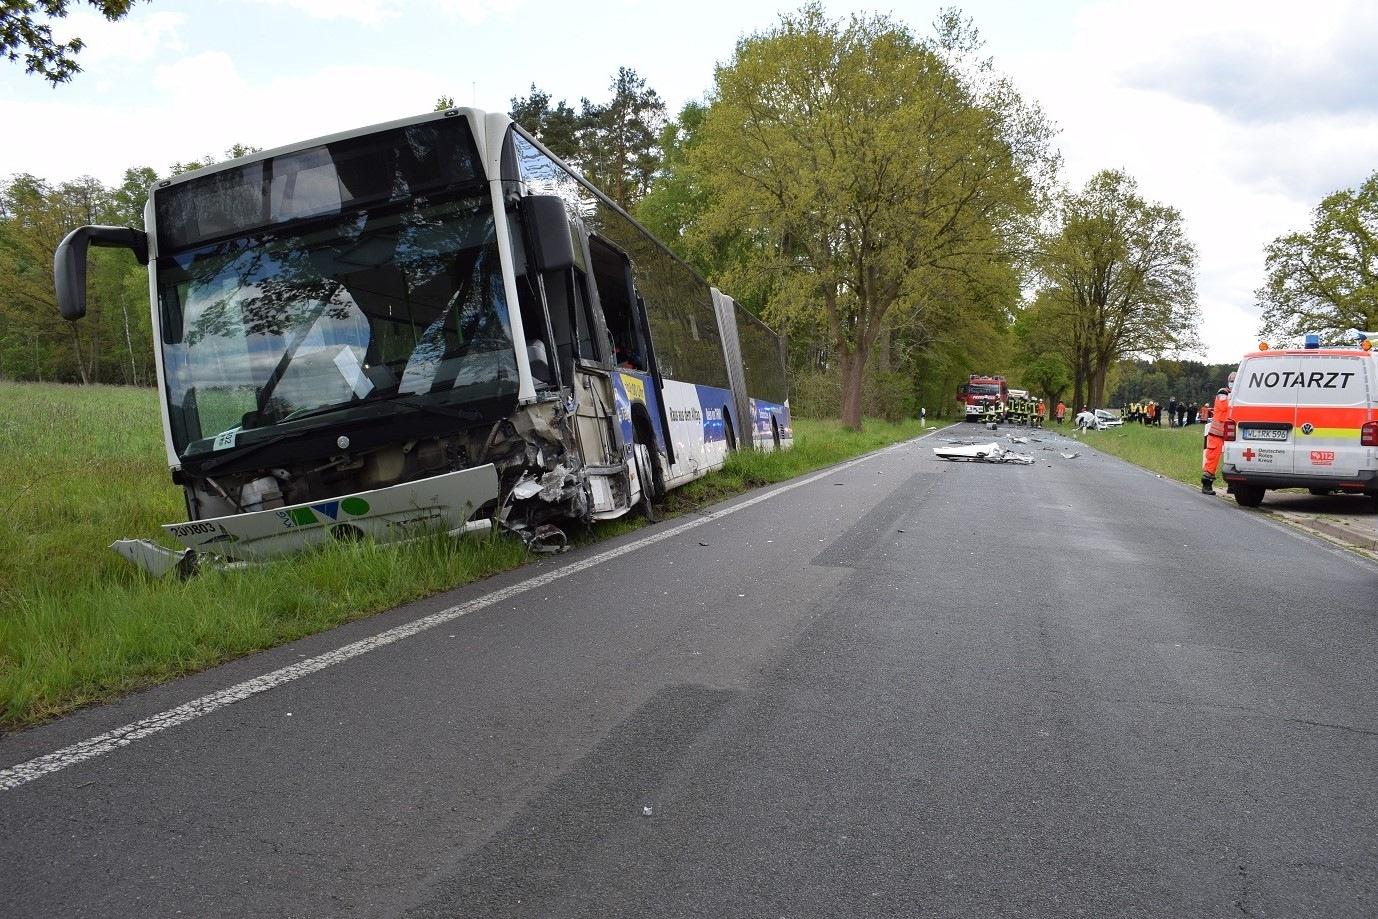 2020-05-14-TH-VU-Asendorf-Bild-2